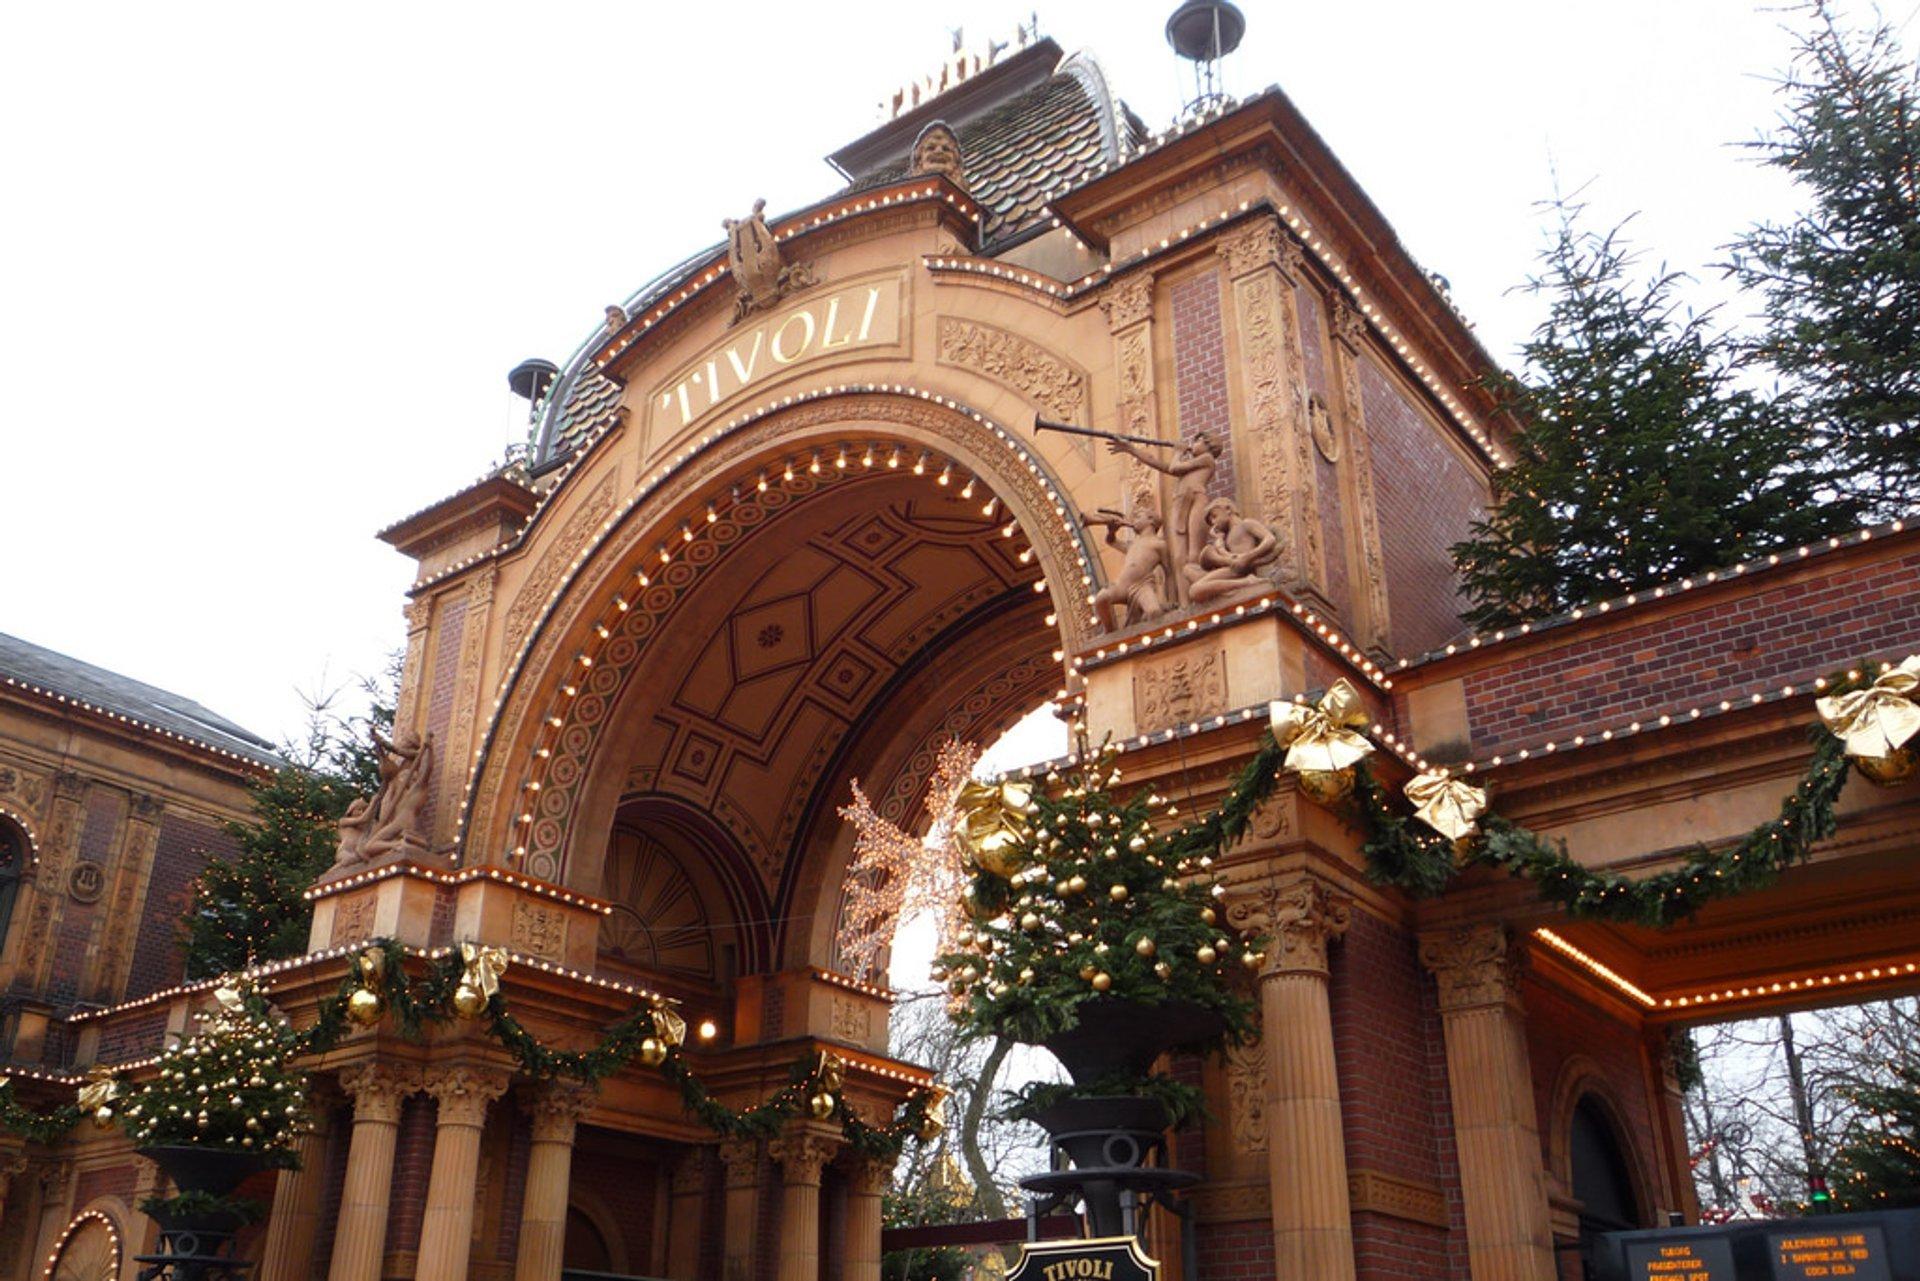 Tivoli Gardens (Summer Season) in Copenhagen 2020 - Best Time